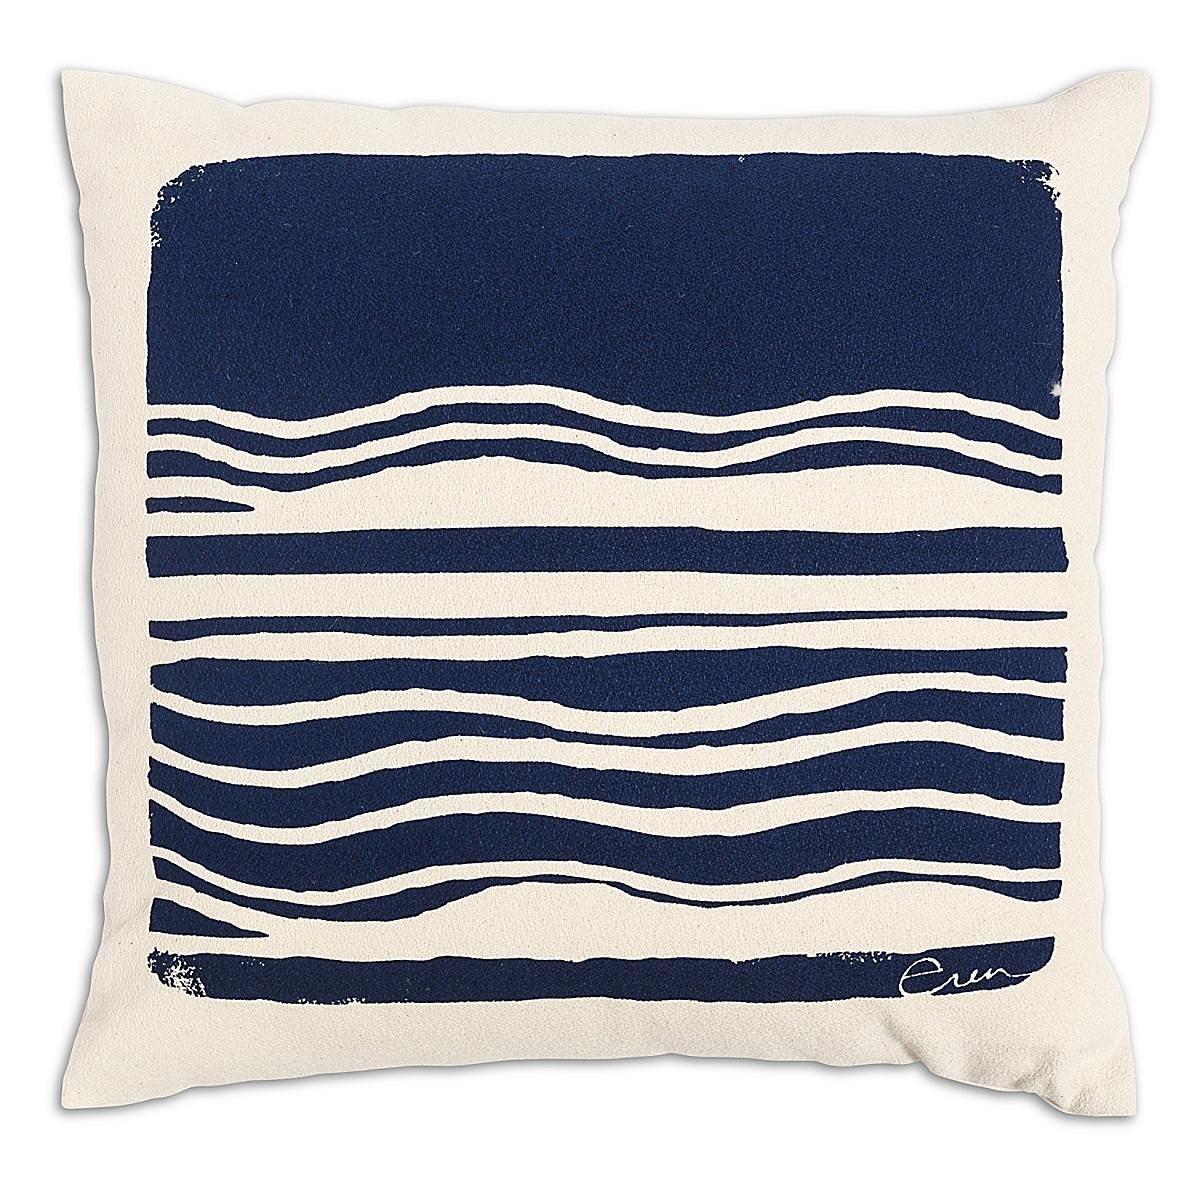 "20"" x 20"" - Wave Pillow: Navy"